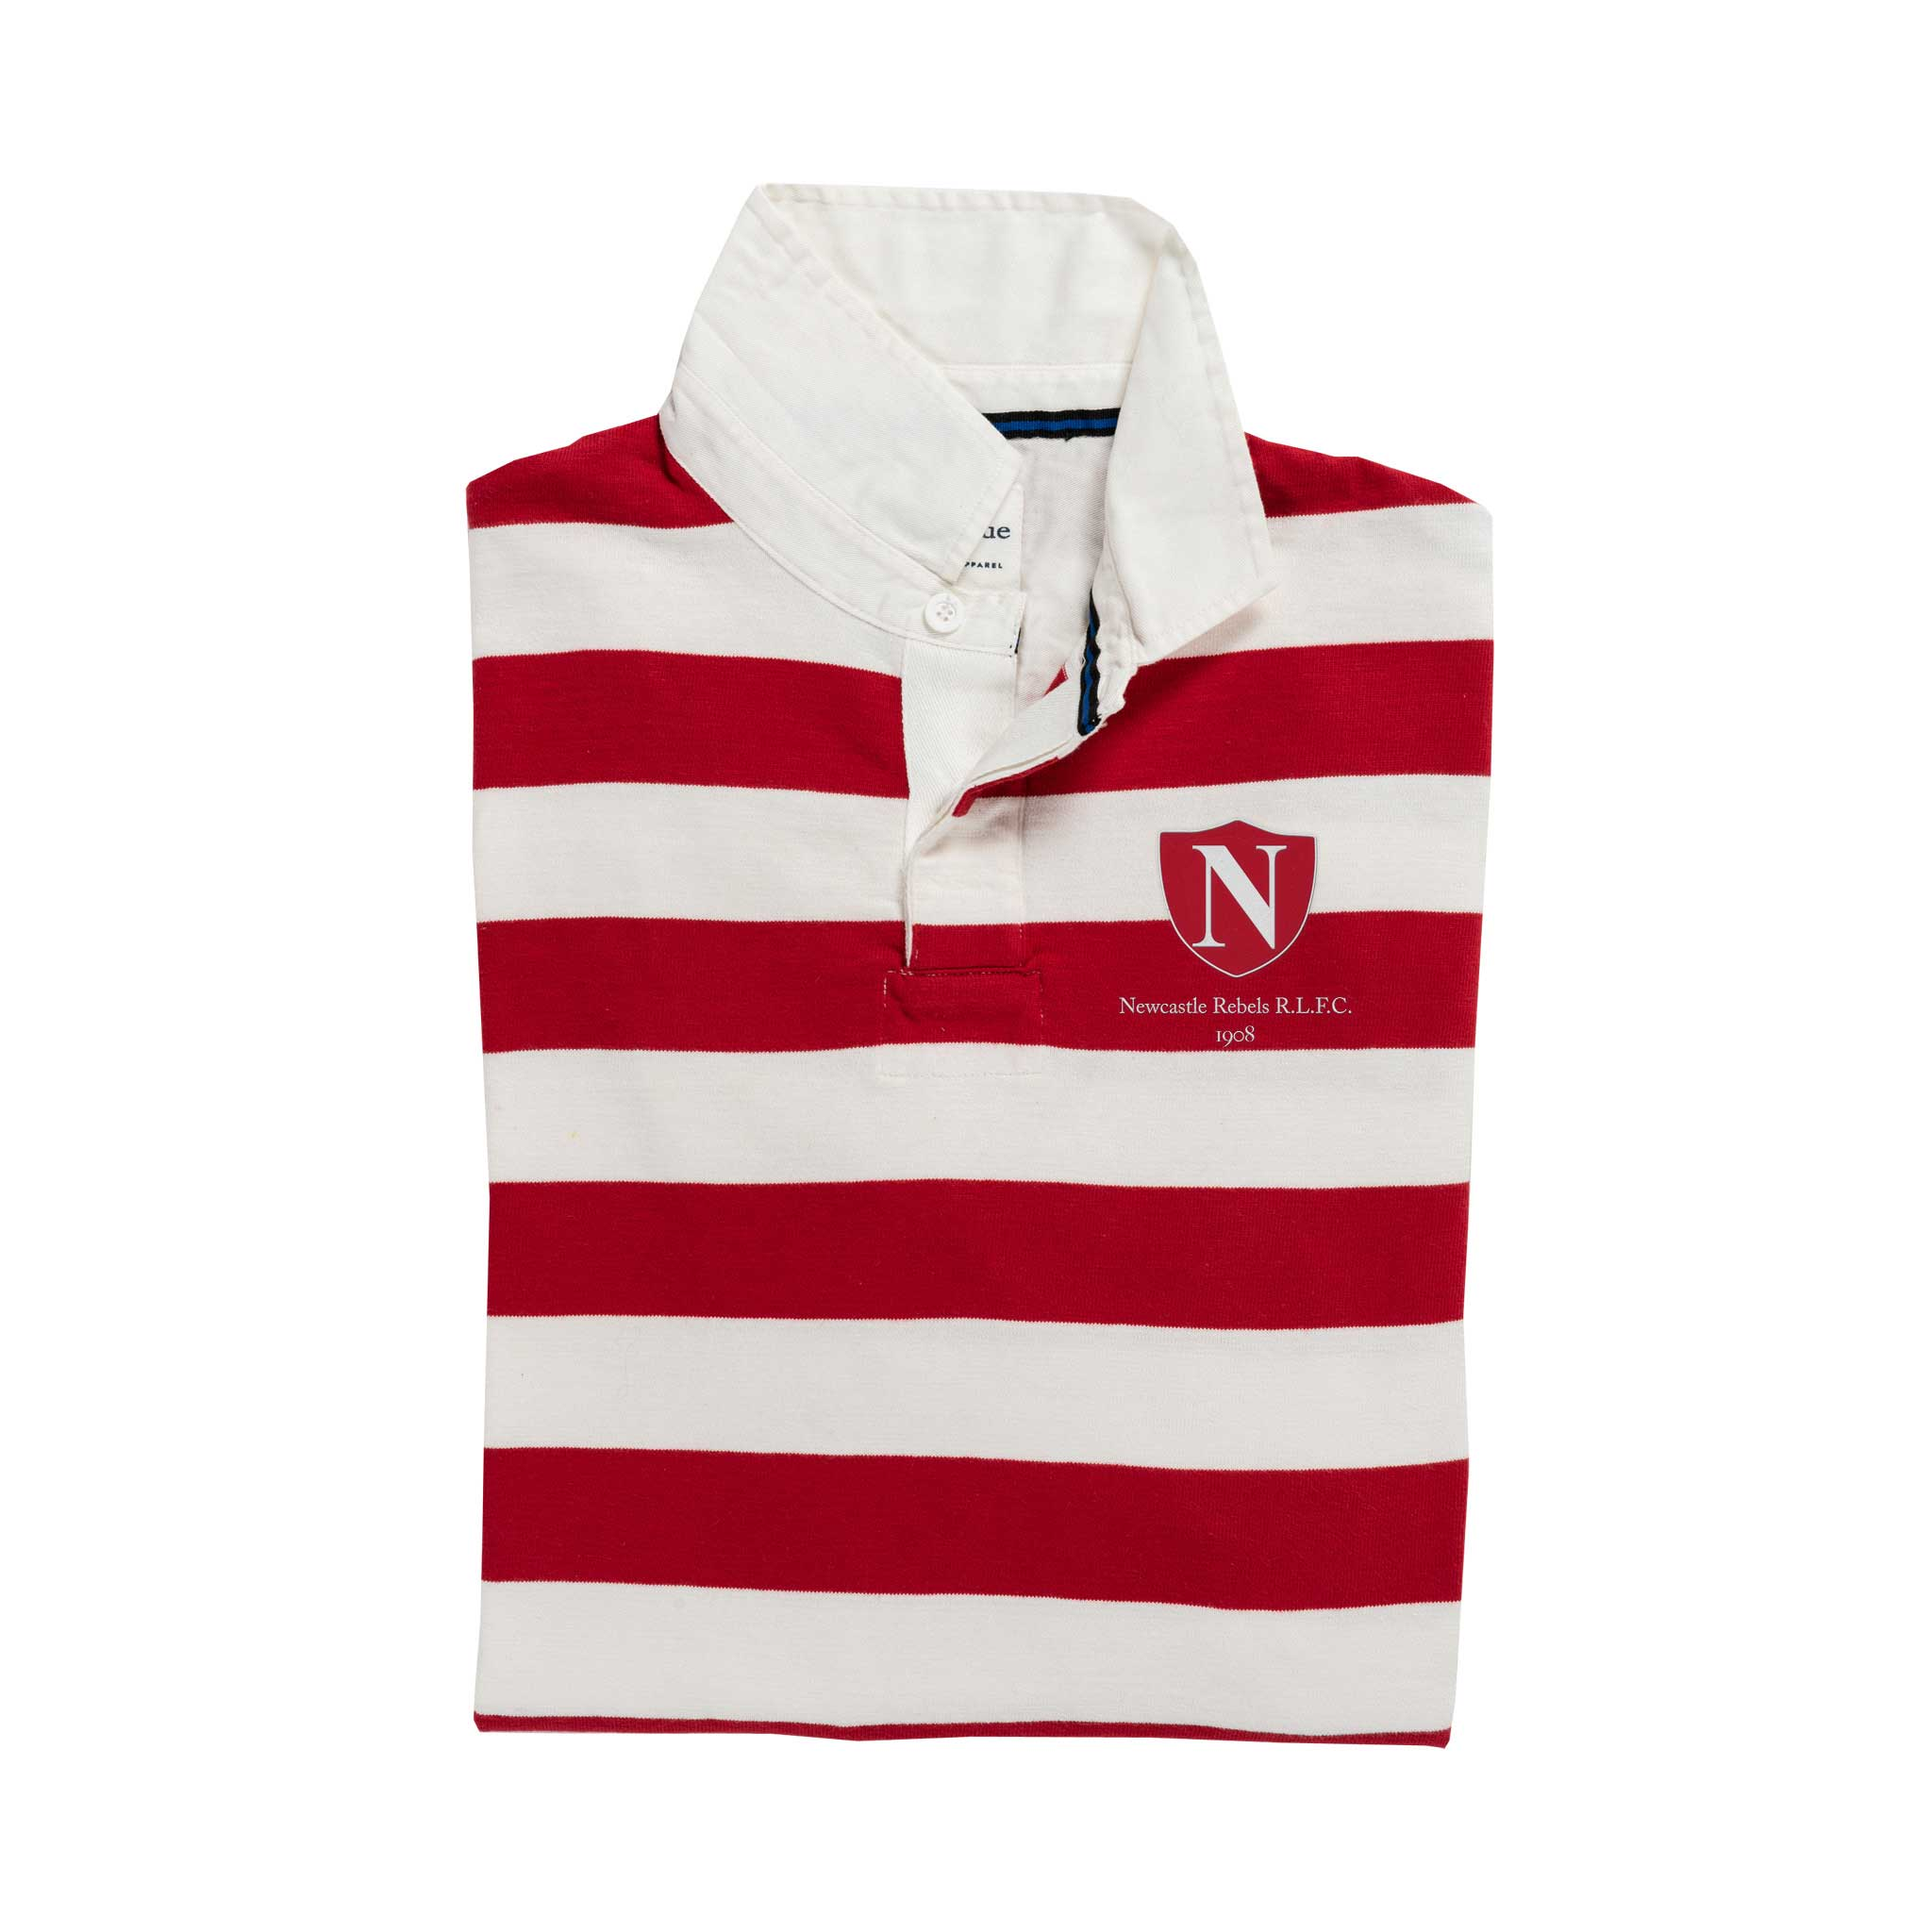 Newcastle Rebels 1908 rugby Shirt_Folded